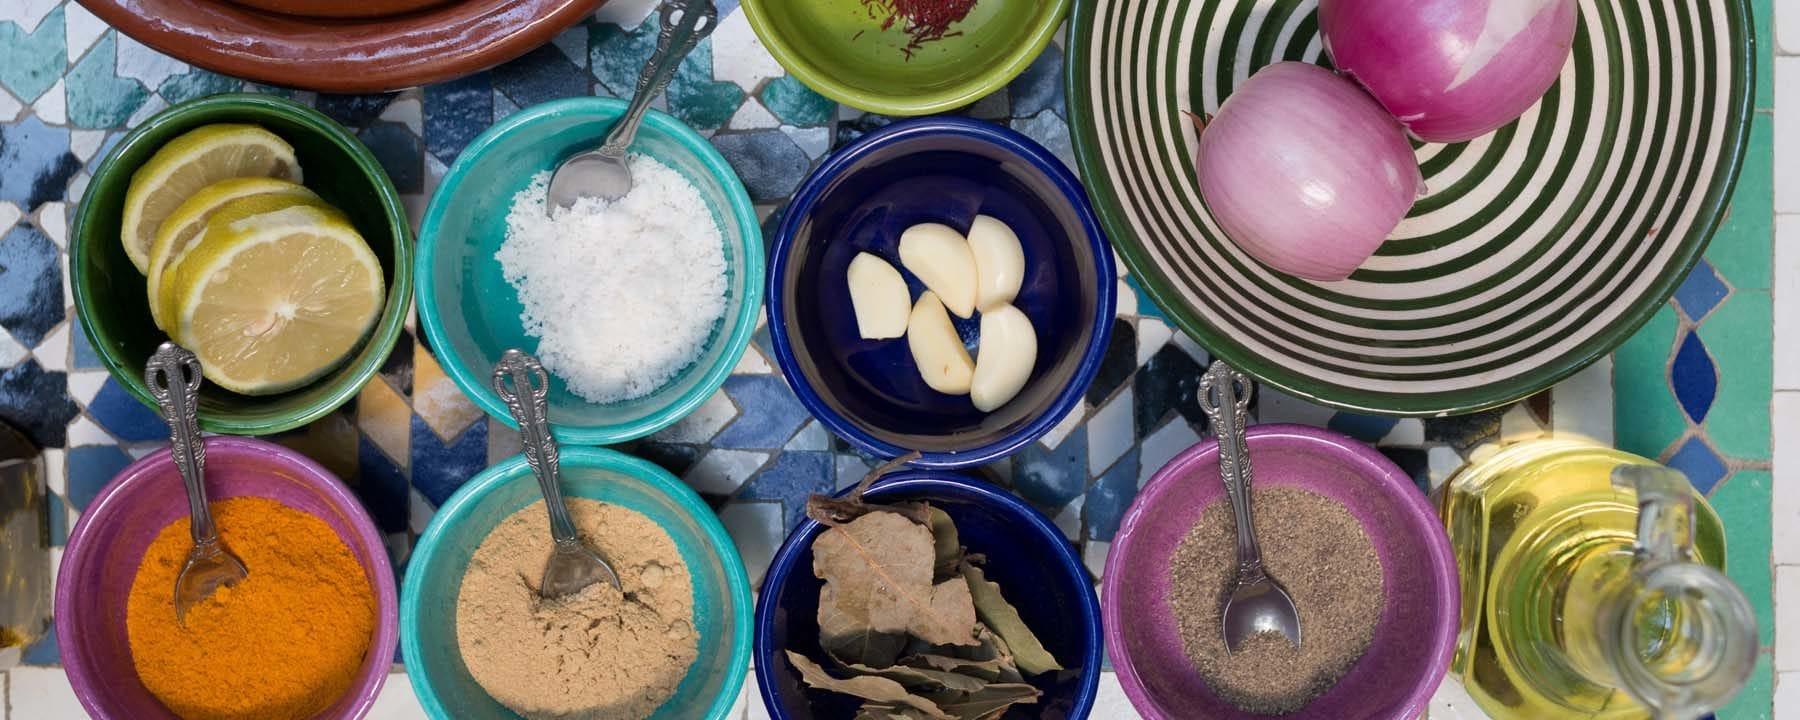 marrakesh-cooking-class_source-origin-hotels